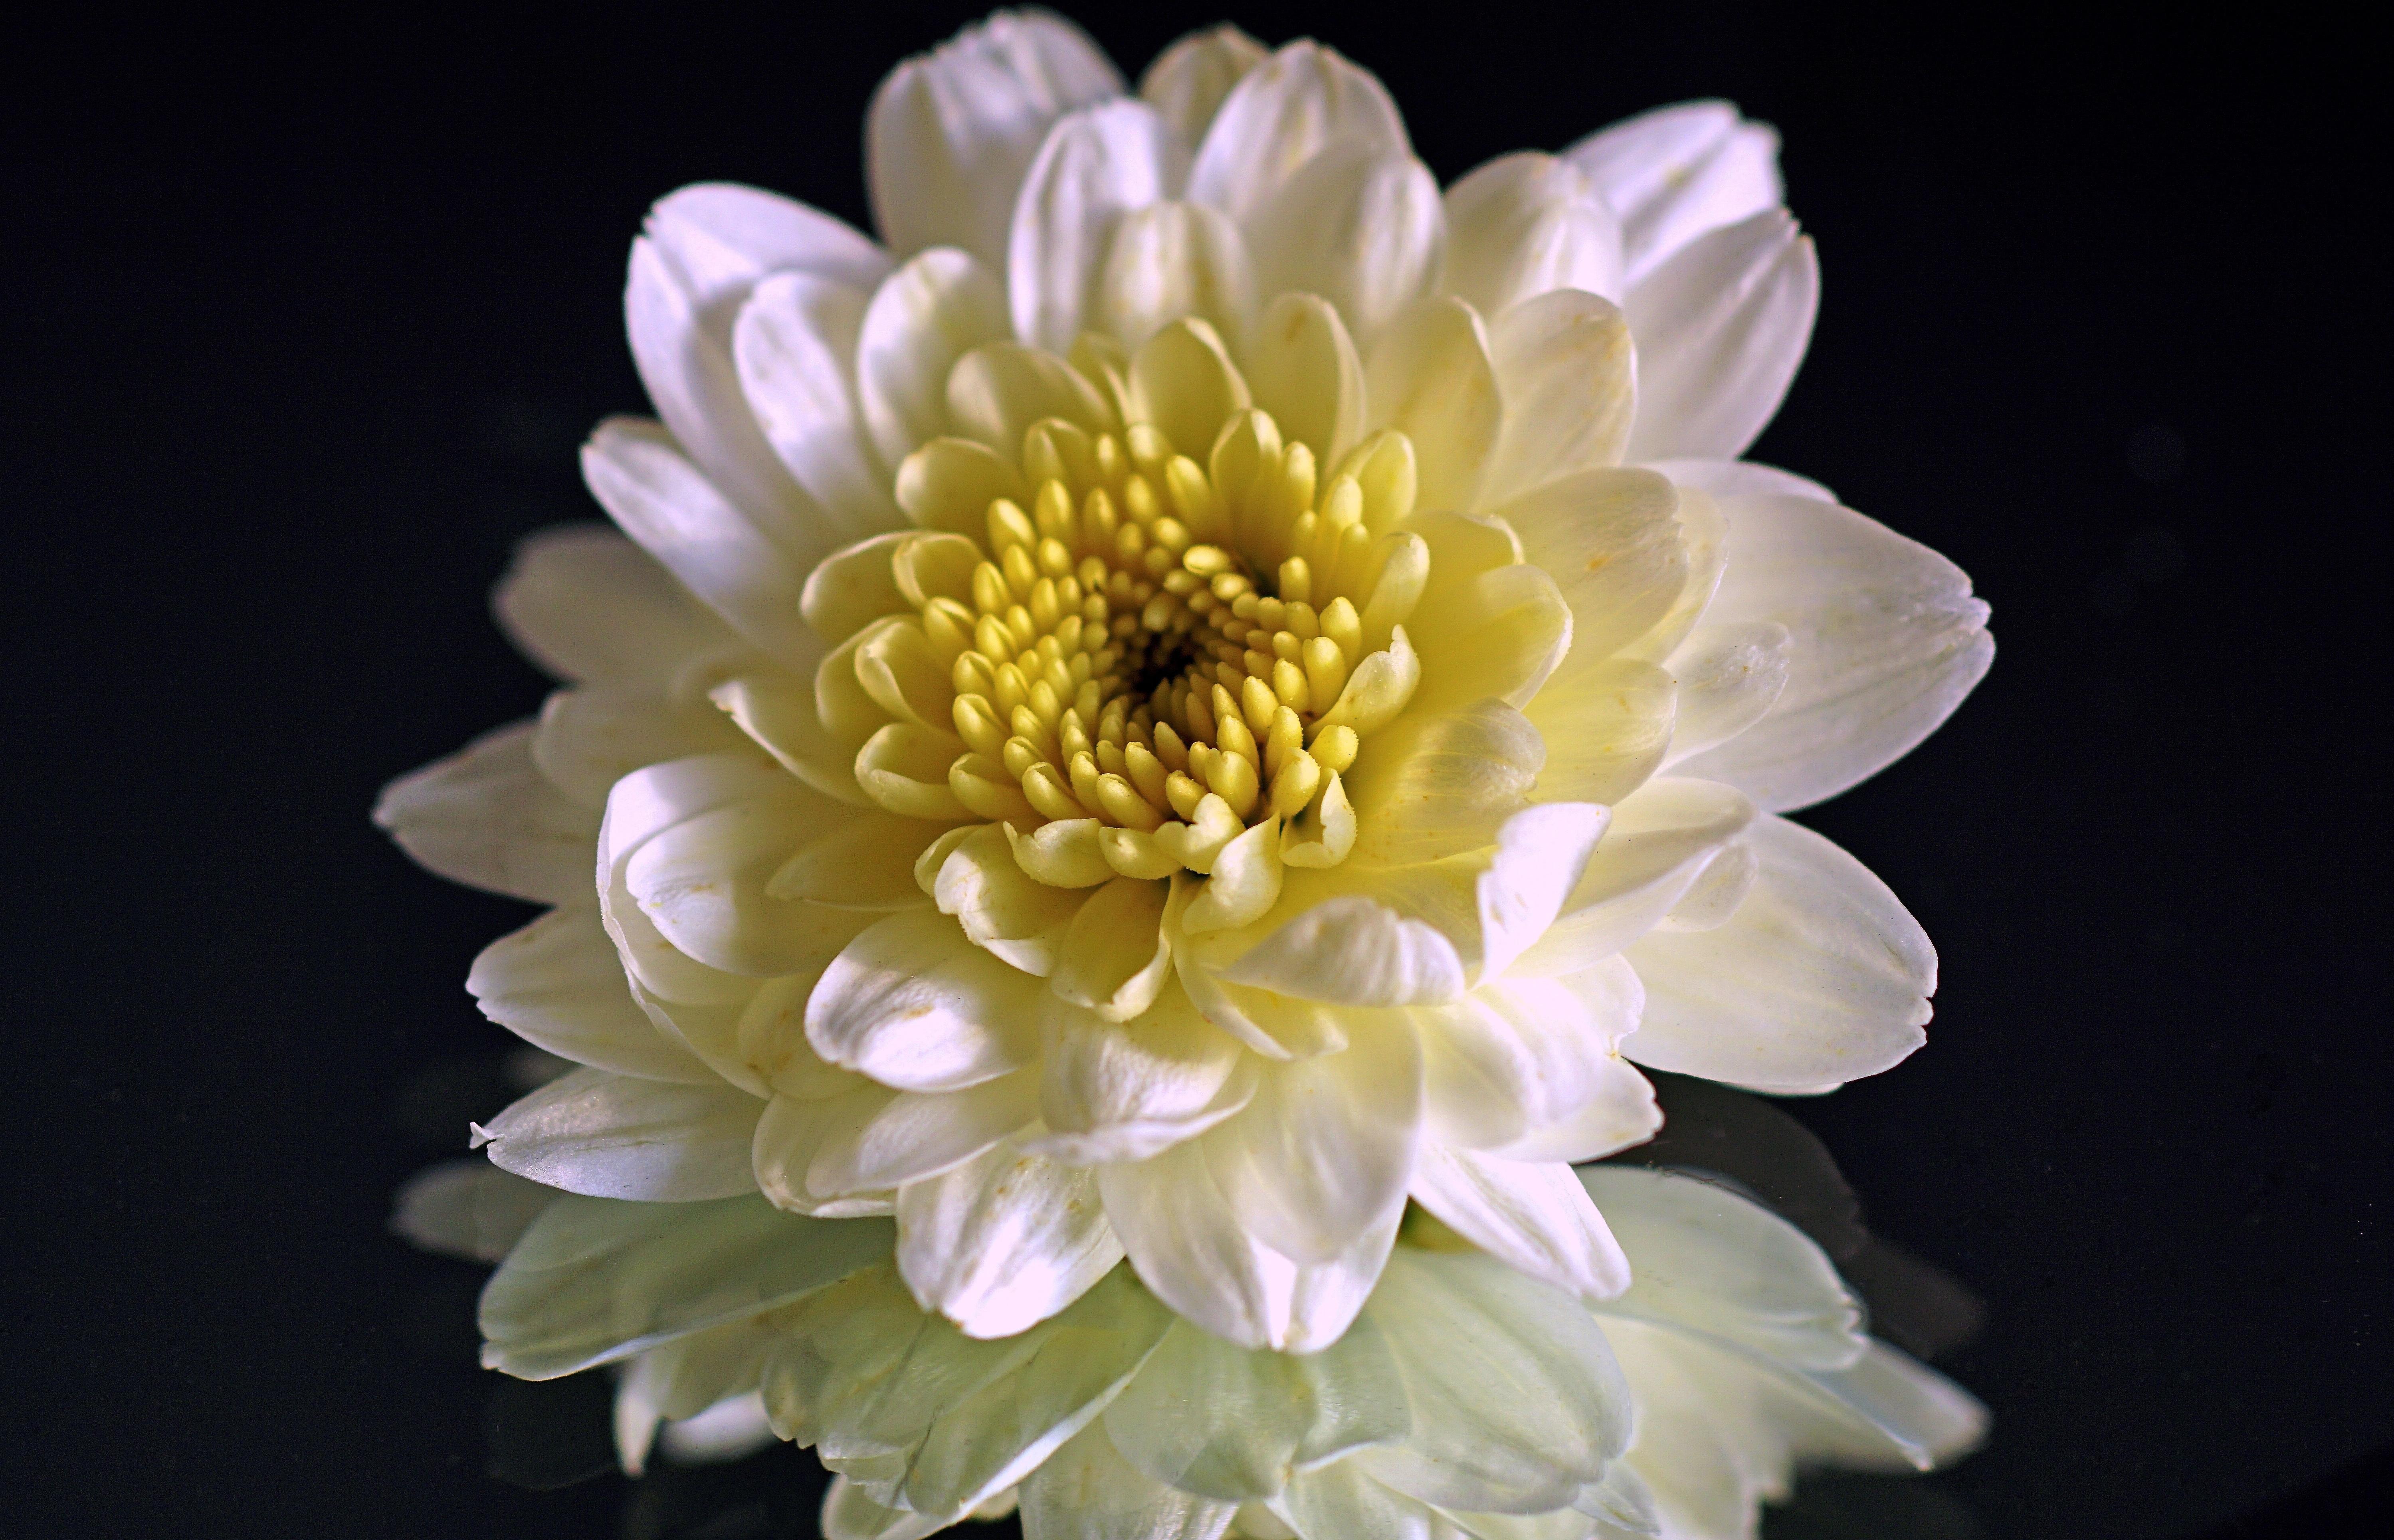 Free images blossom white petal bloom yellow flora free images blossom white petal bloom yellow flora arrangement close up dahlia reflect aster mirror autumn flower floristry izmirmasajfo